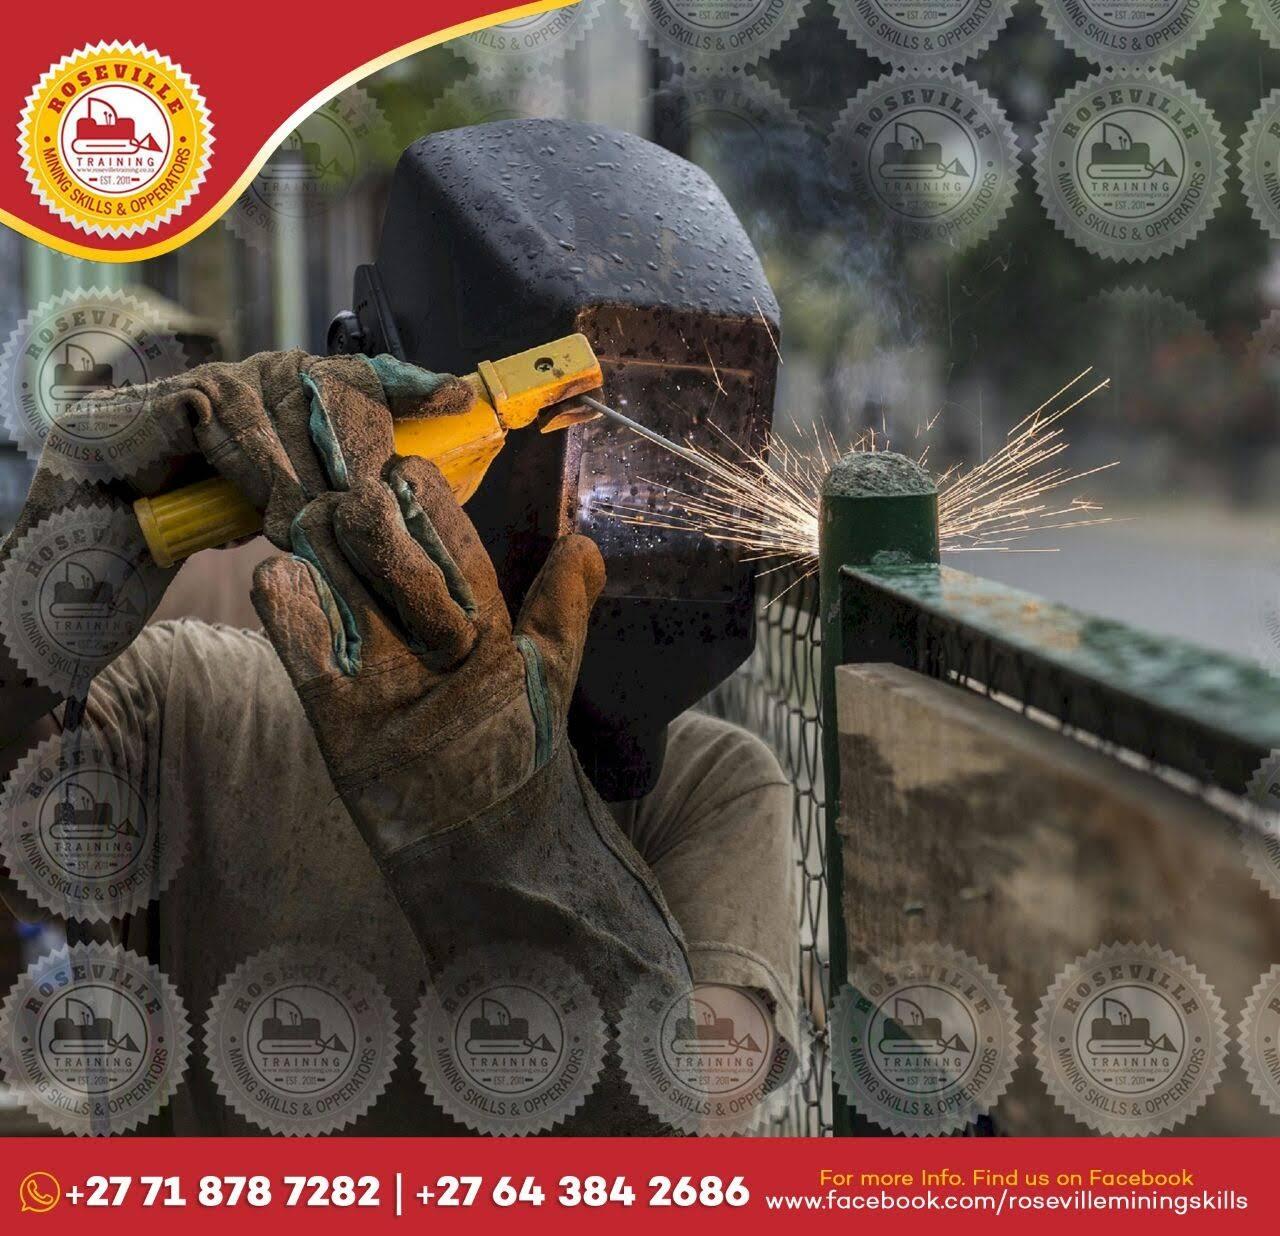 Boiler maker skills Welding Ark CO2 LHD Scoop +2771878728